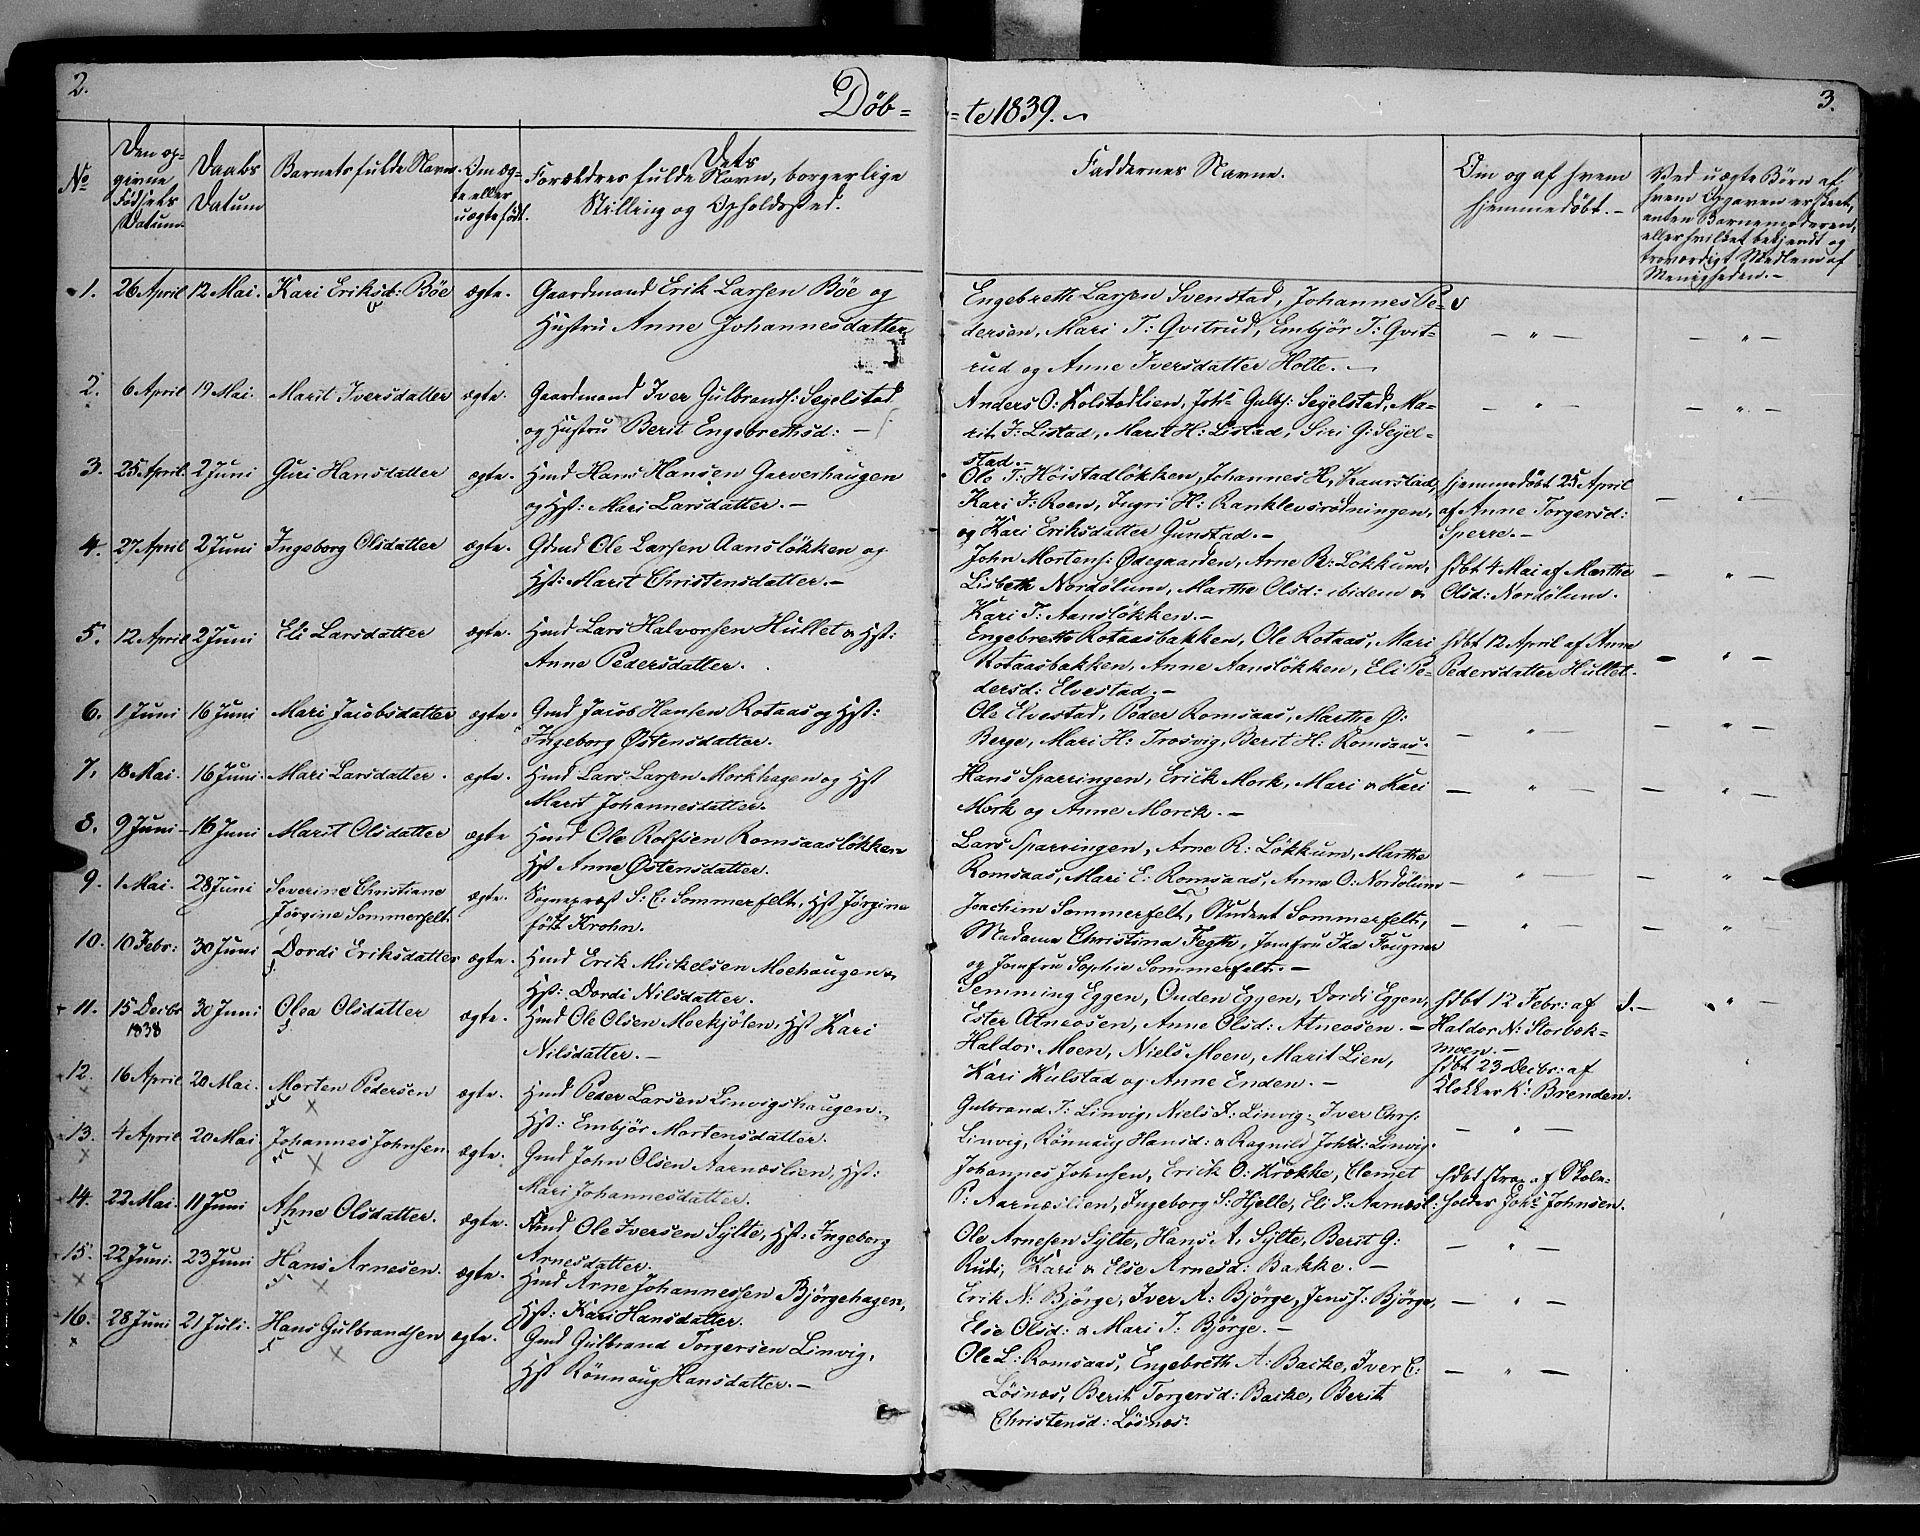 SAH, Ringebu prestekontor, Ministerialbok nr. 5, 1839-1848, s. 2-3